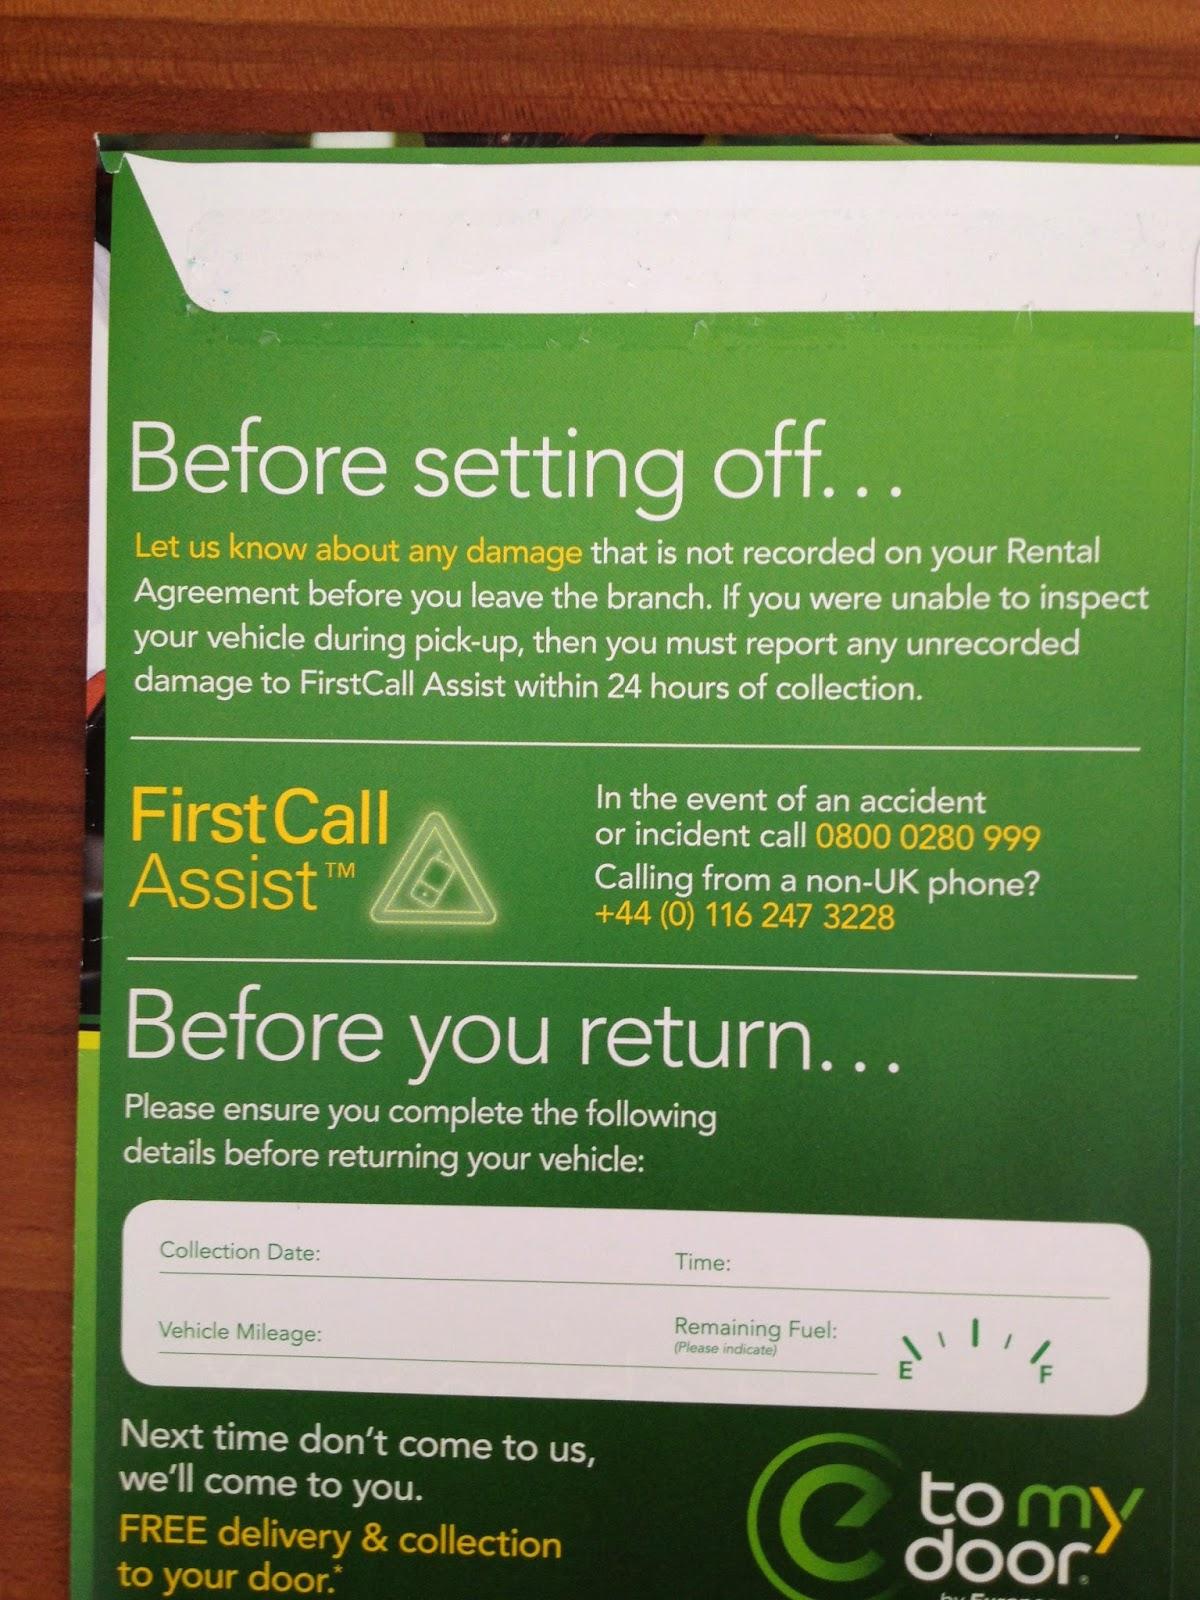 Europcar & Tipoa Car Hire emergency assistance UK number 0800 0280 999